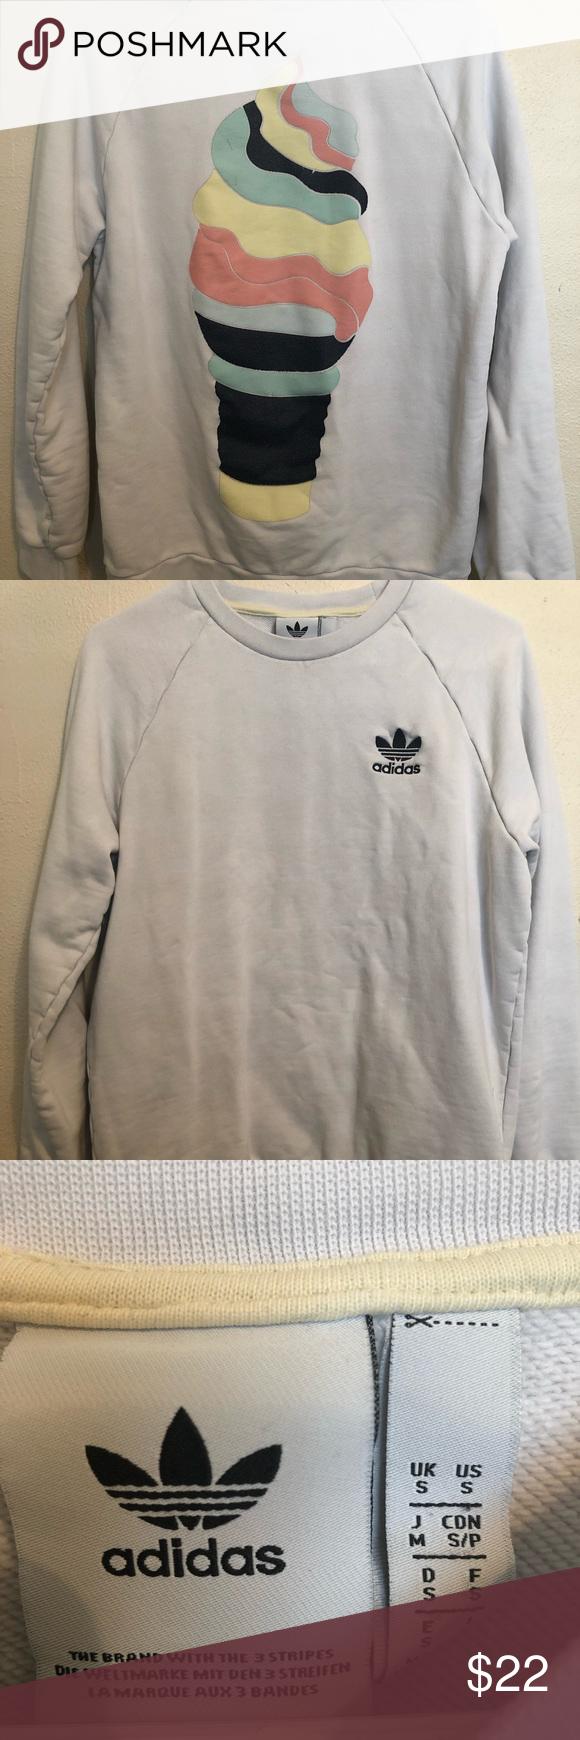 Adidas Sweatshirt White Adidas Sweatshirt With Ice Cream Cone Print On The Back Adidas Sweaters Crewneck Adidas Sweatshirt Sweatshirts Adidas Sweater [ 1740 x 580 Pixel ]